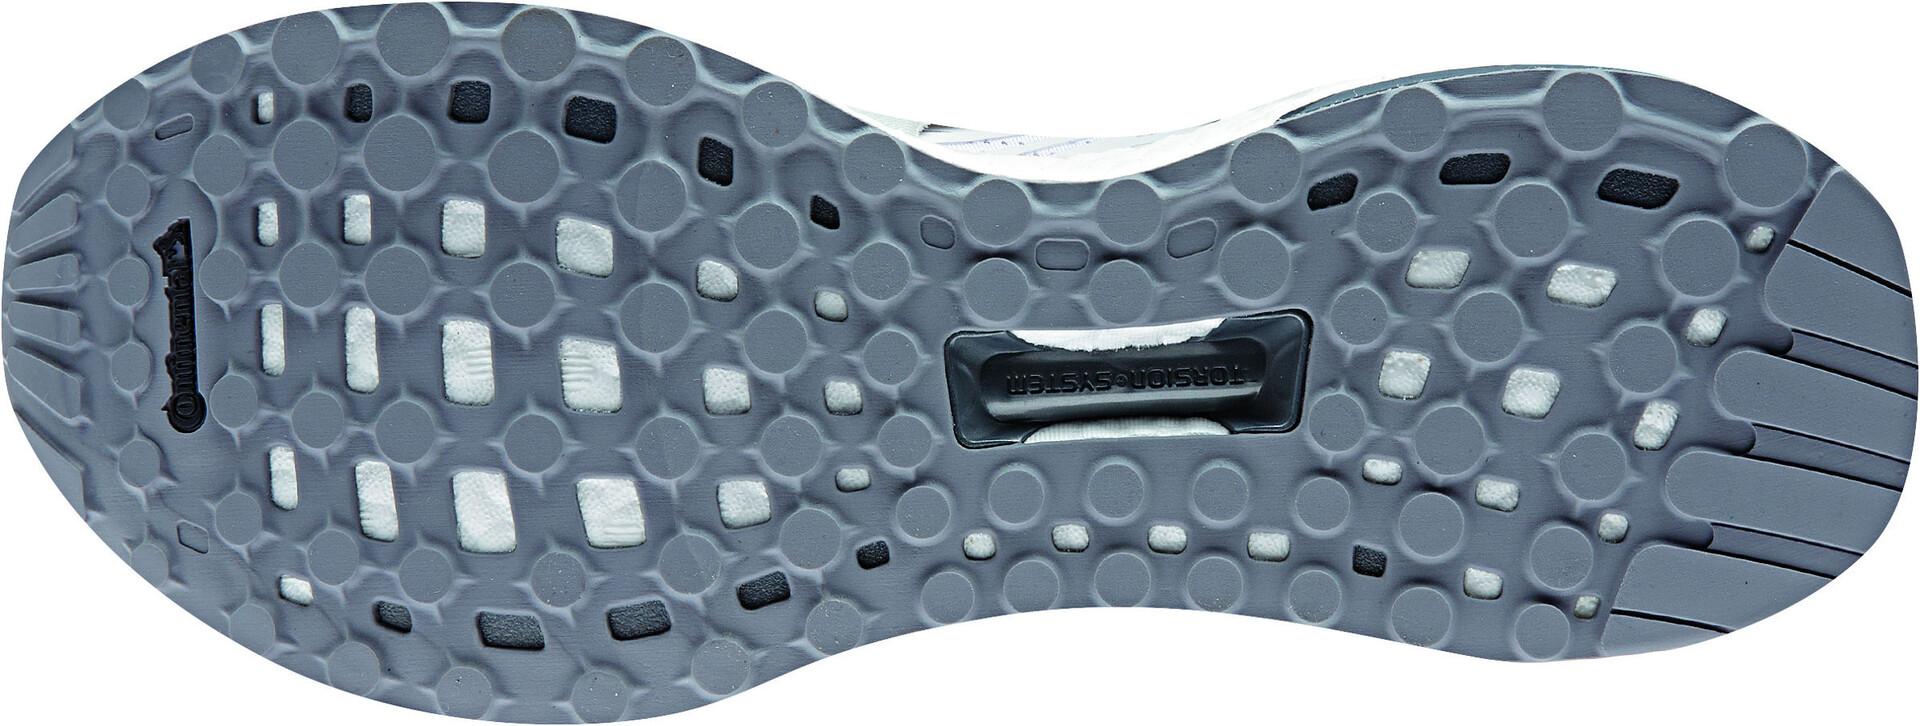 Valkoinen Addnature Juoksukengät Miehet Adidas Boost fi Energy qCwUC8I